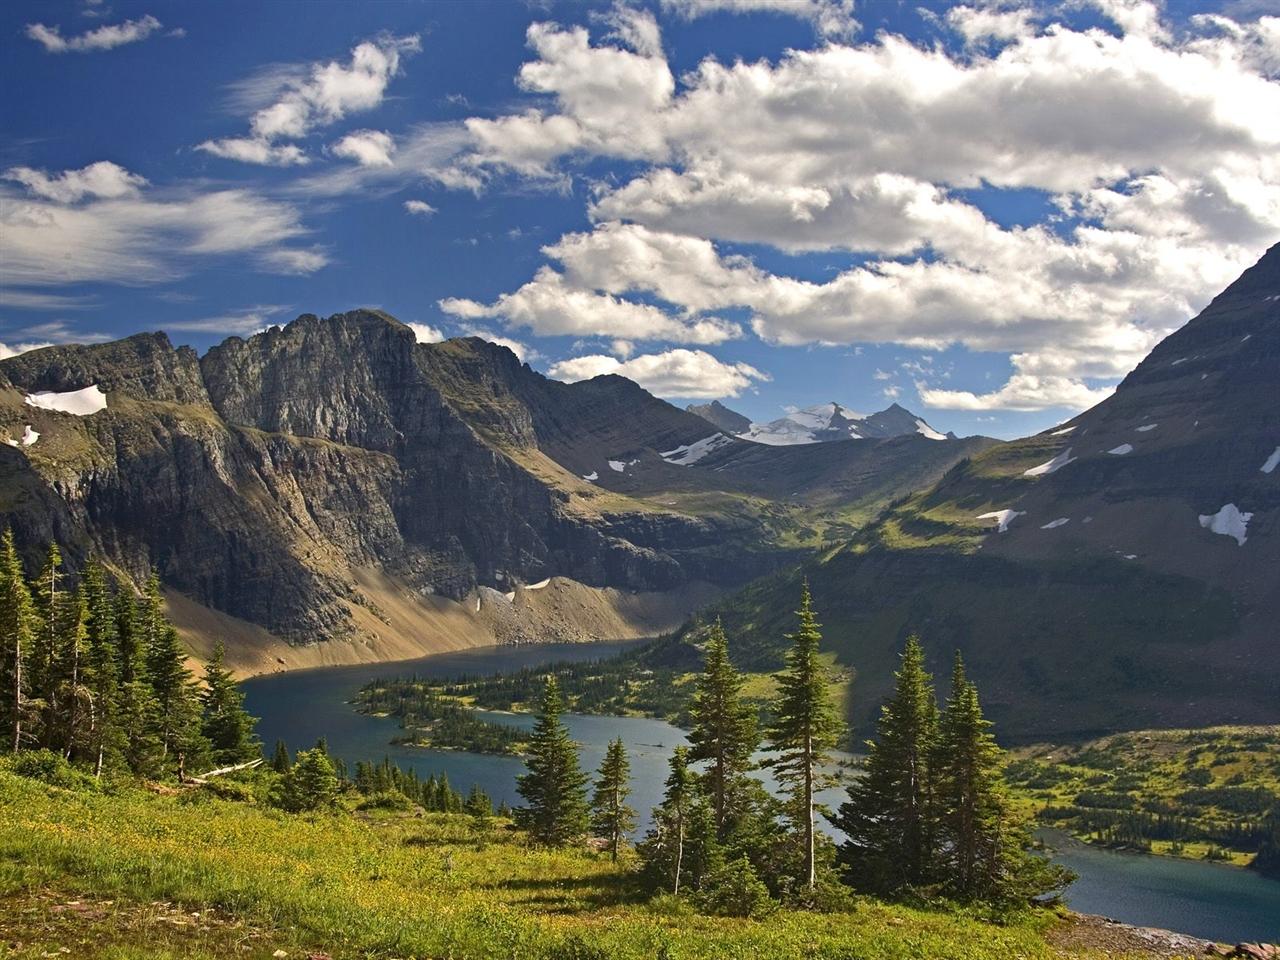 montana Montana United States of America 1280x960